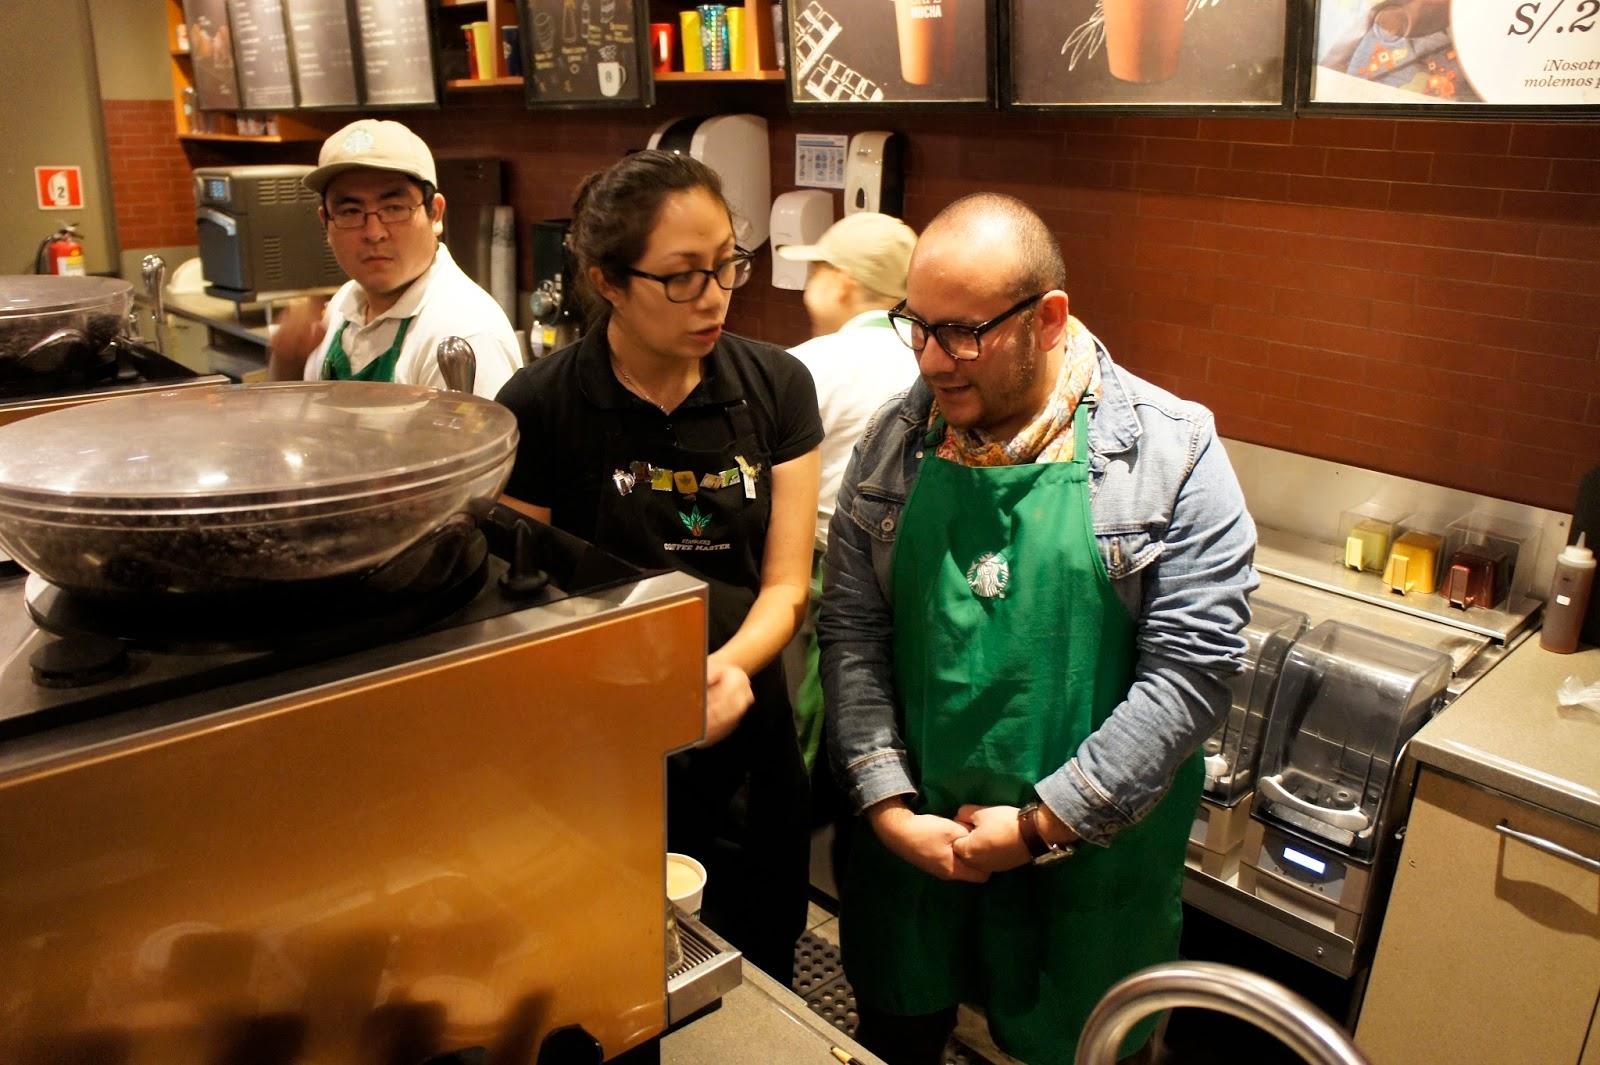 Daniel Linares, Menifiesto, blogger, preparando café, Starbucks